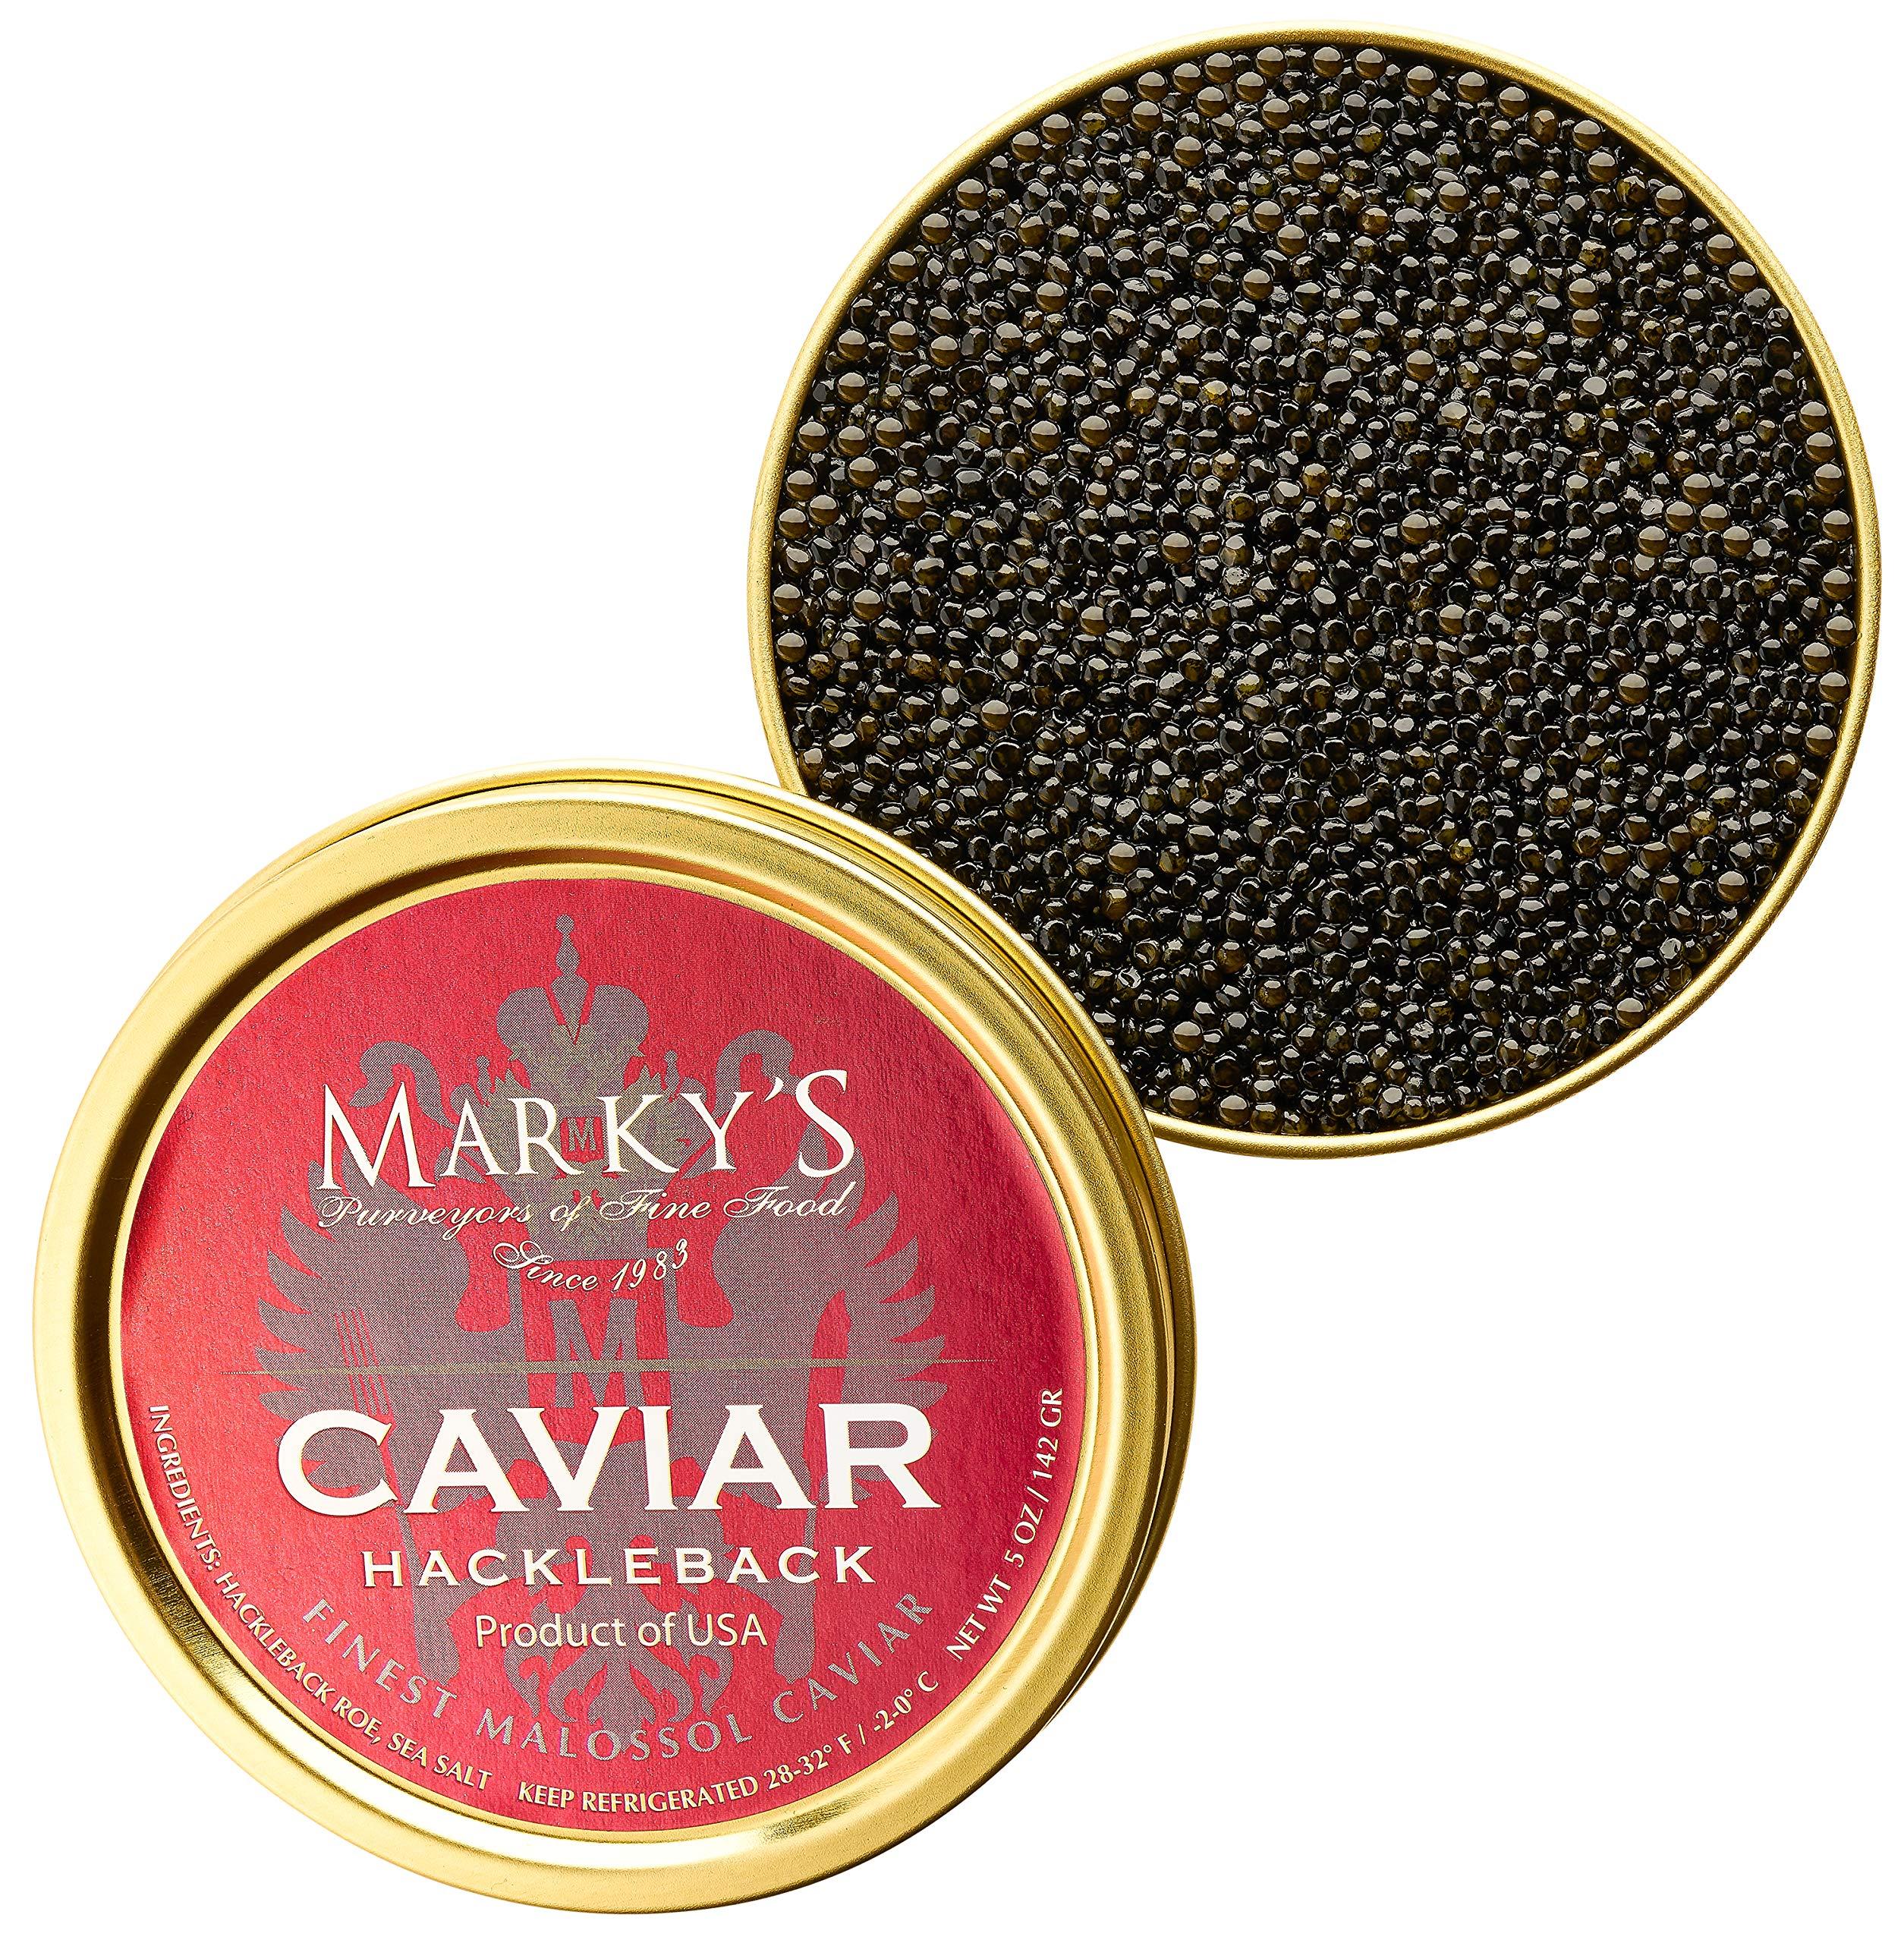 Marky's Hackleback Caviar Black American Sturgeon - 9 oz